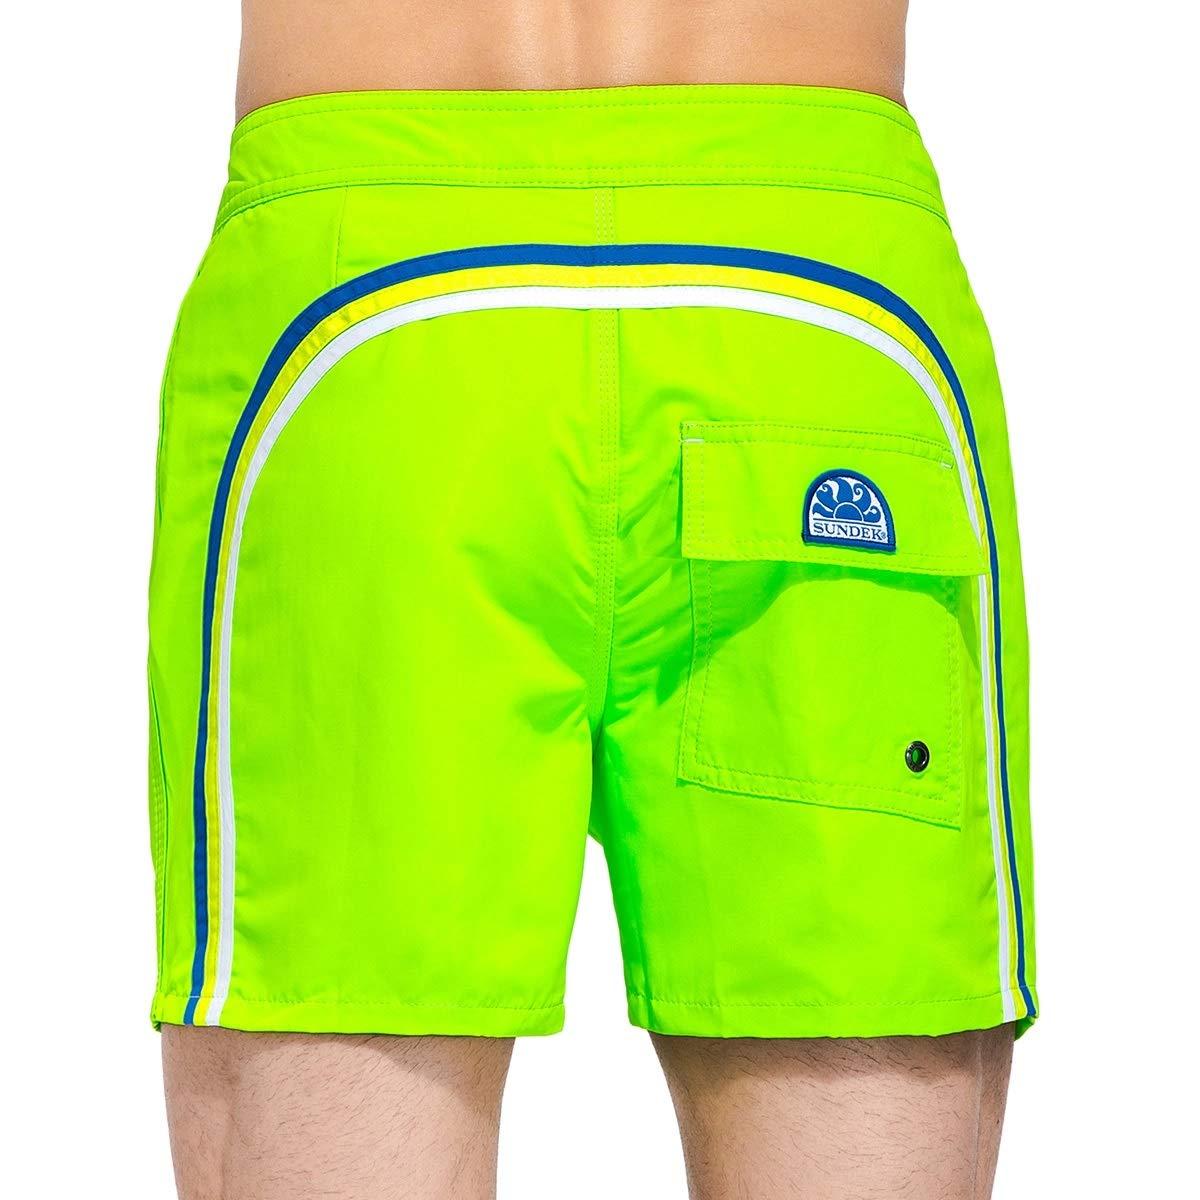 d33382e92ad6cb Sundek Verde Pantaloncini da bagno Uomo 502 - Face Shop